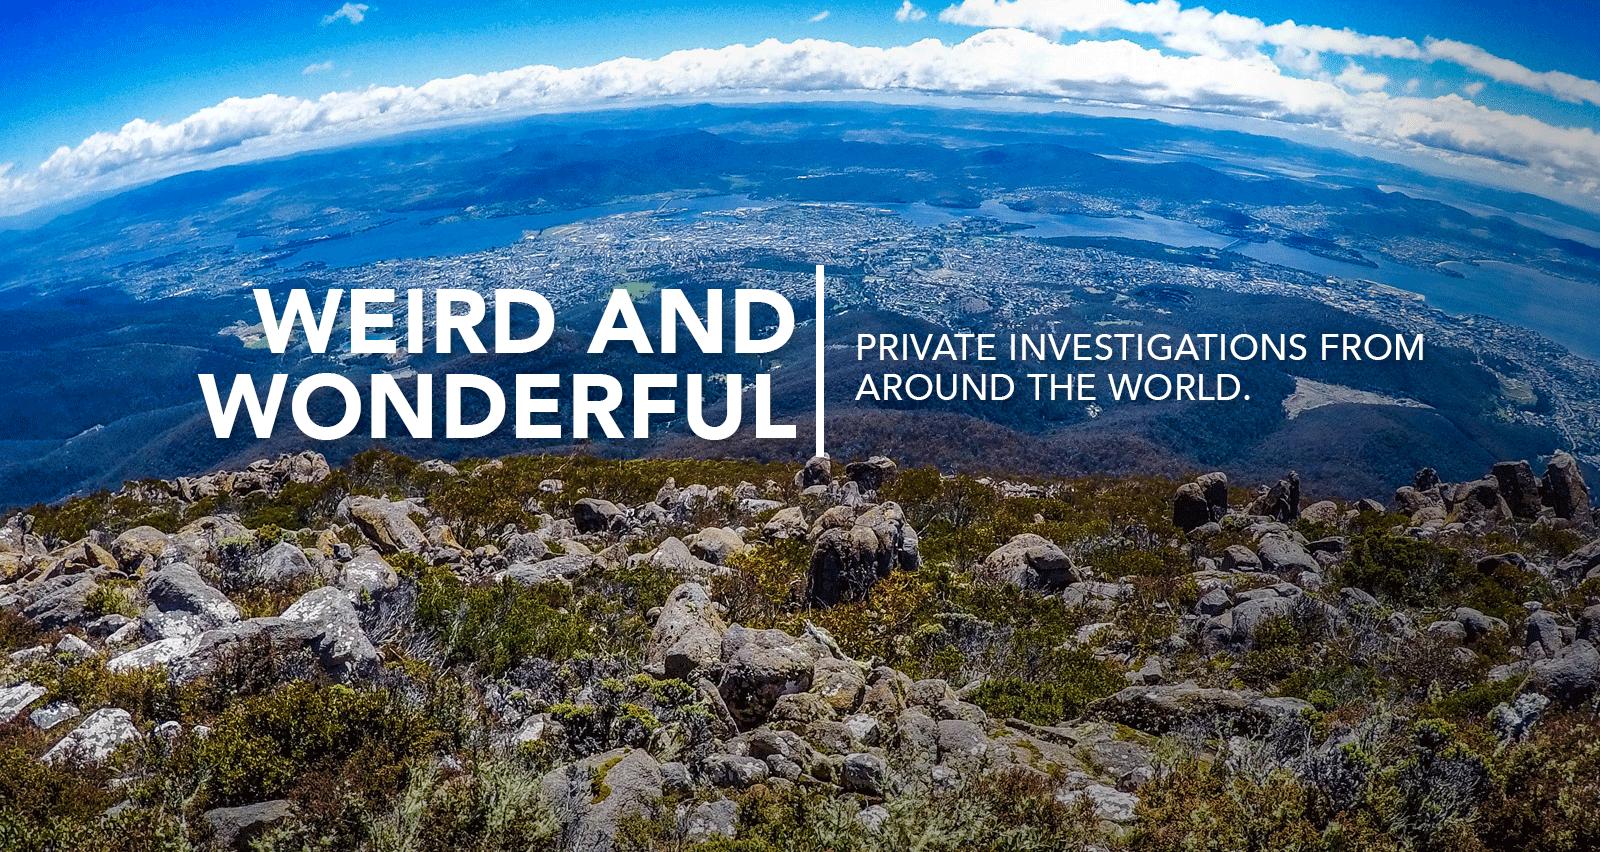 Weird and Wonderful investigations